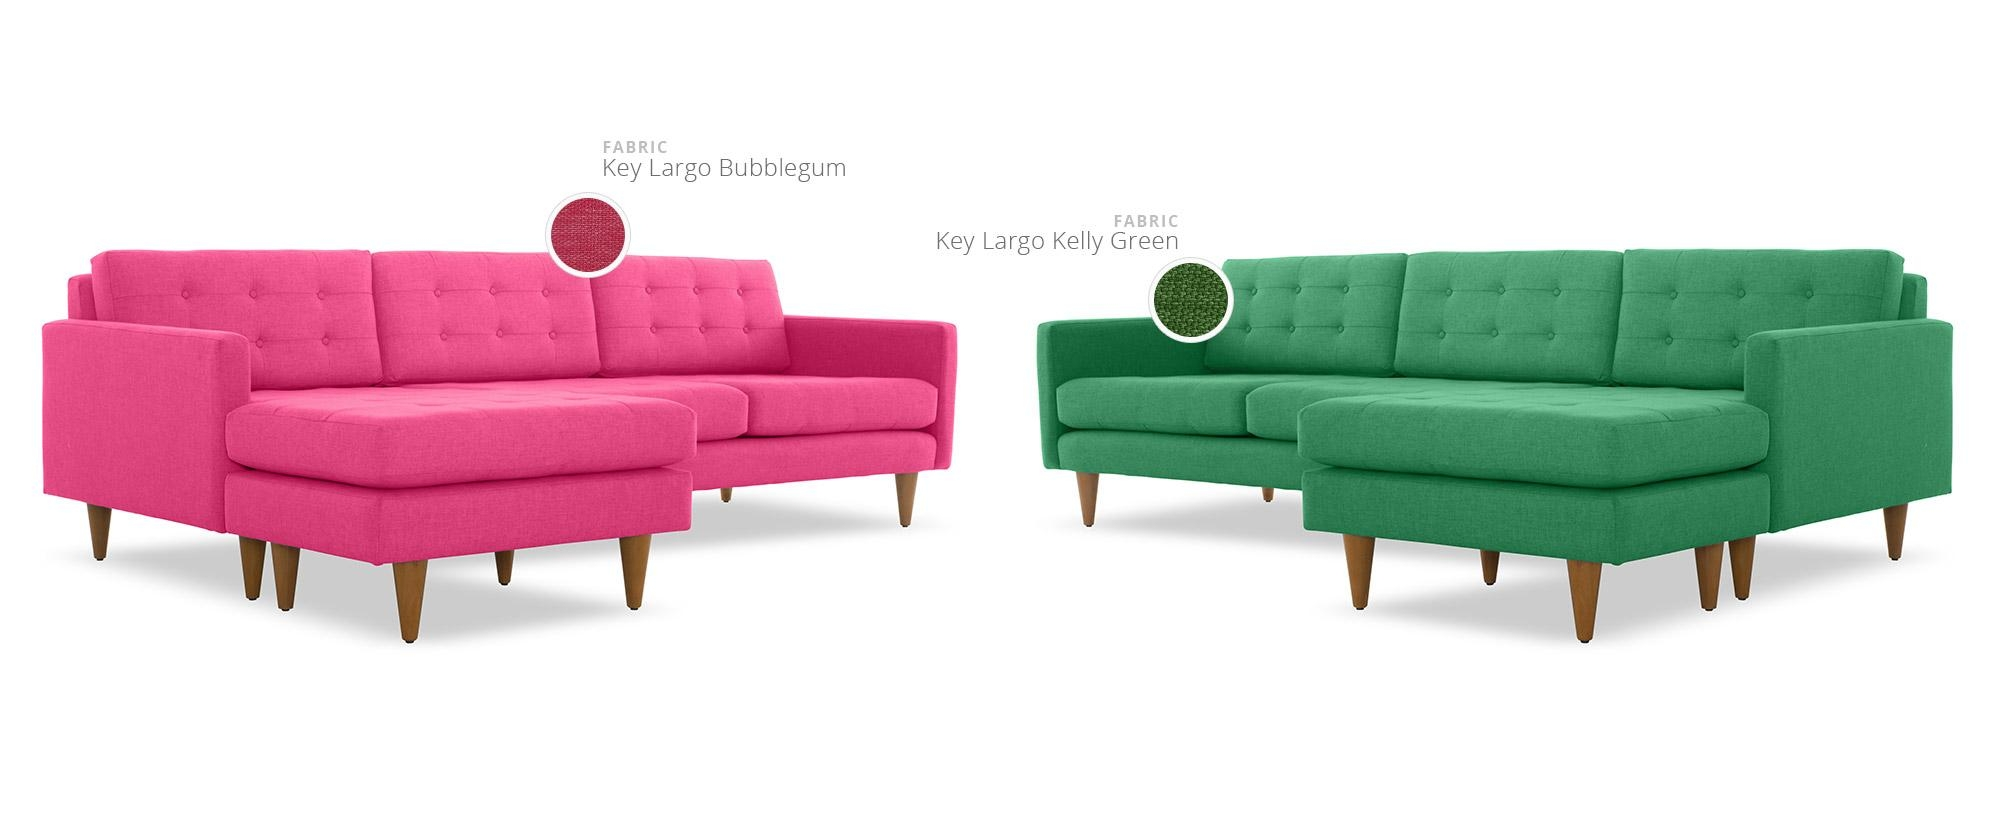 Mid Century Modern Sectional Sofas | Joybird In Mid Century Modern Leather Sectional (View 12 of 20)